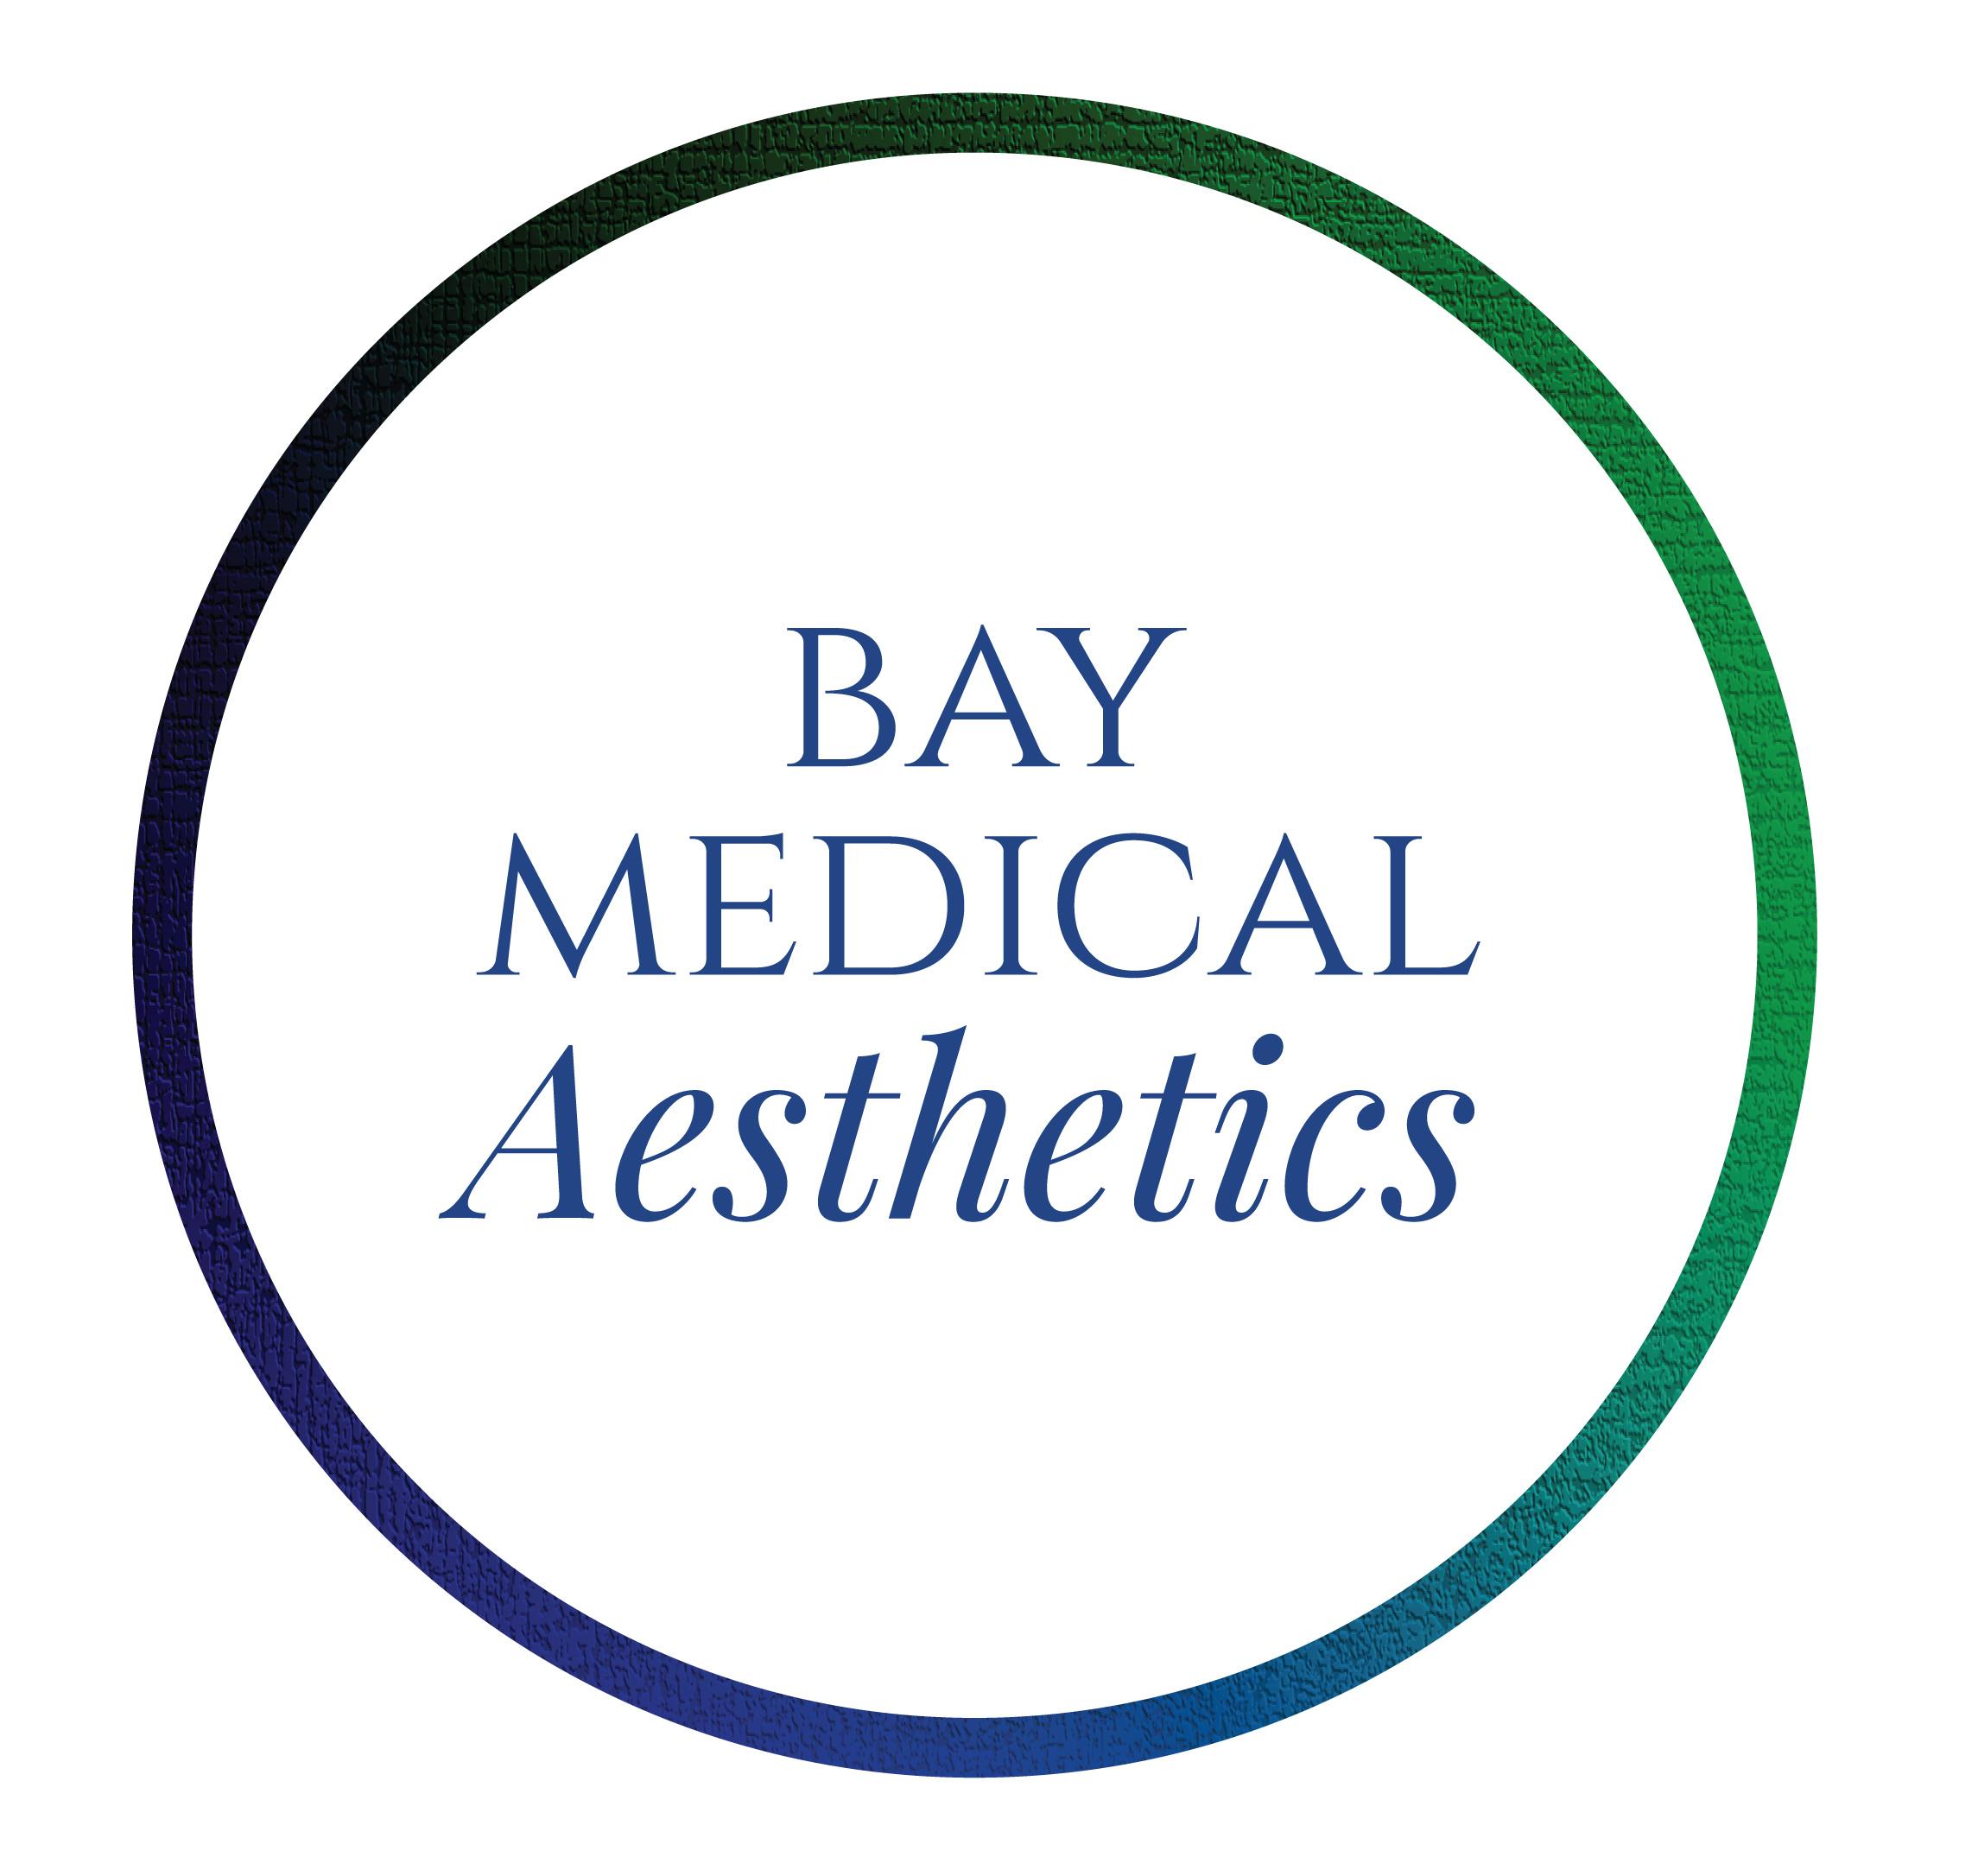 Bay Medical Aesthetics